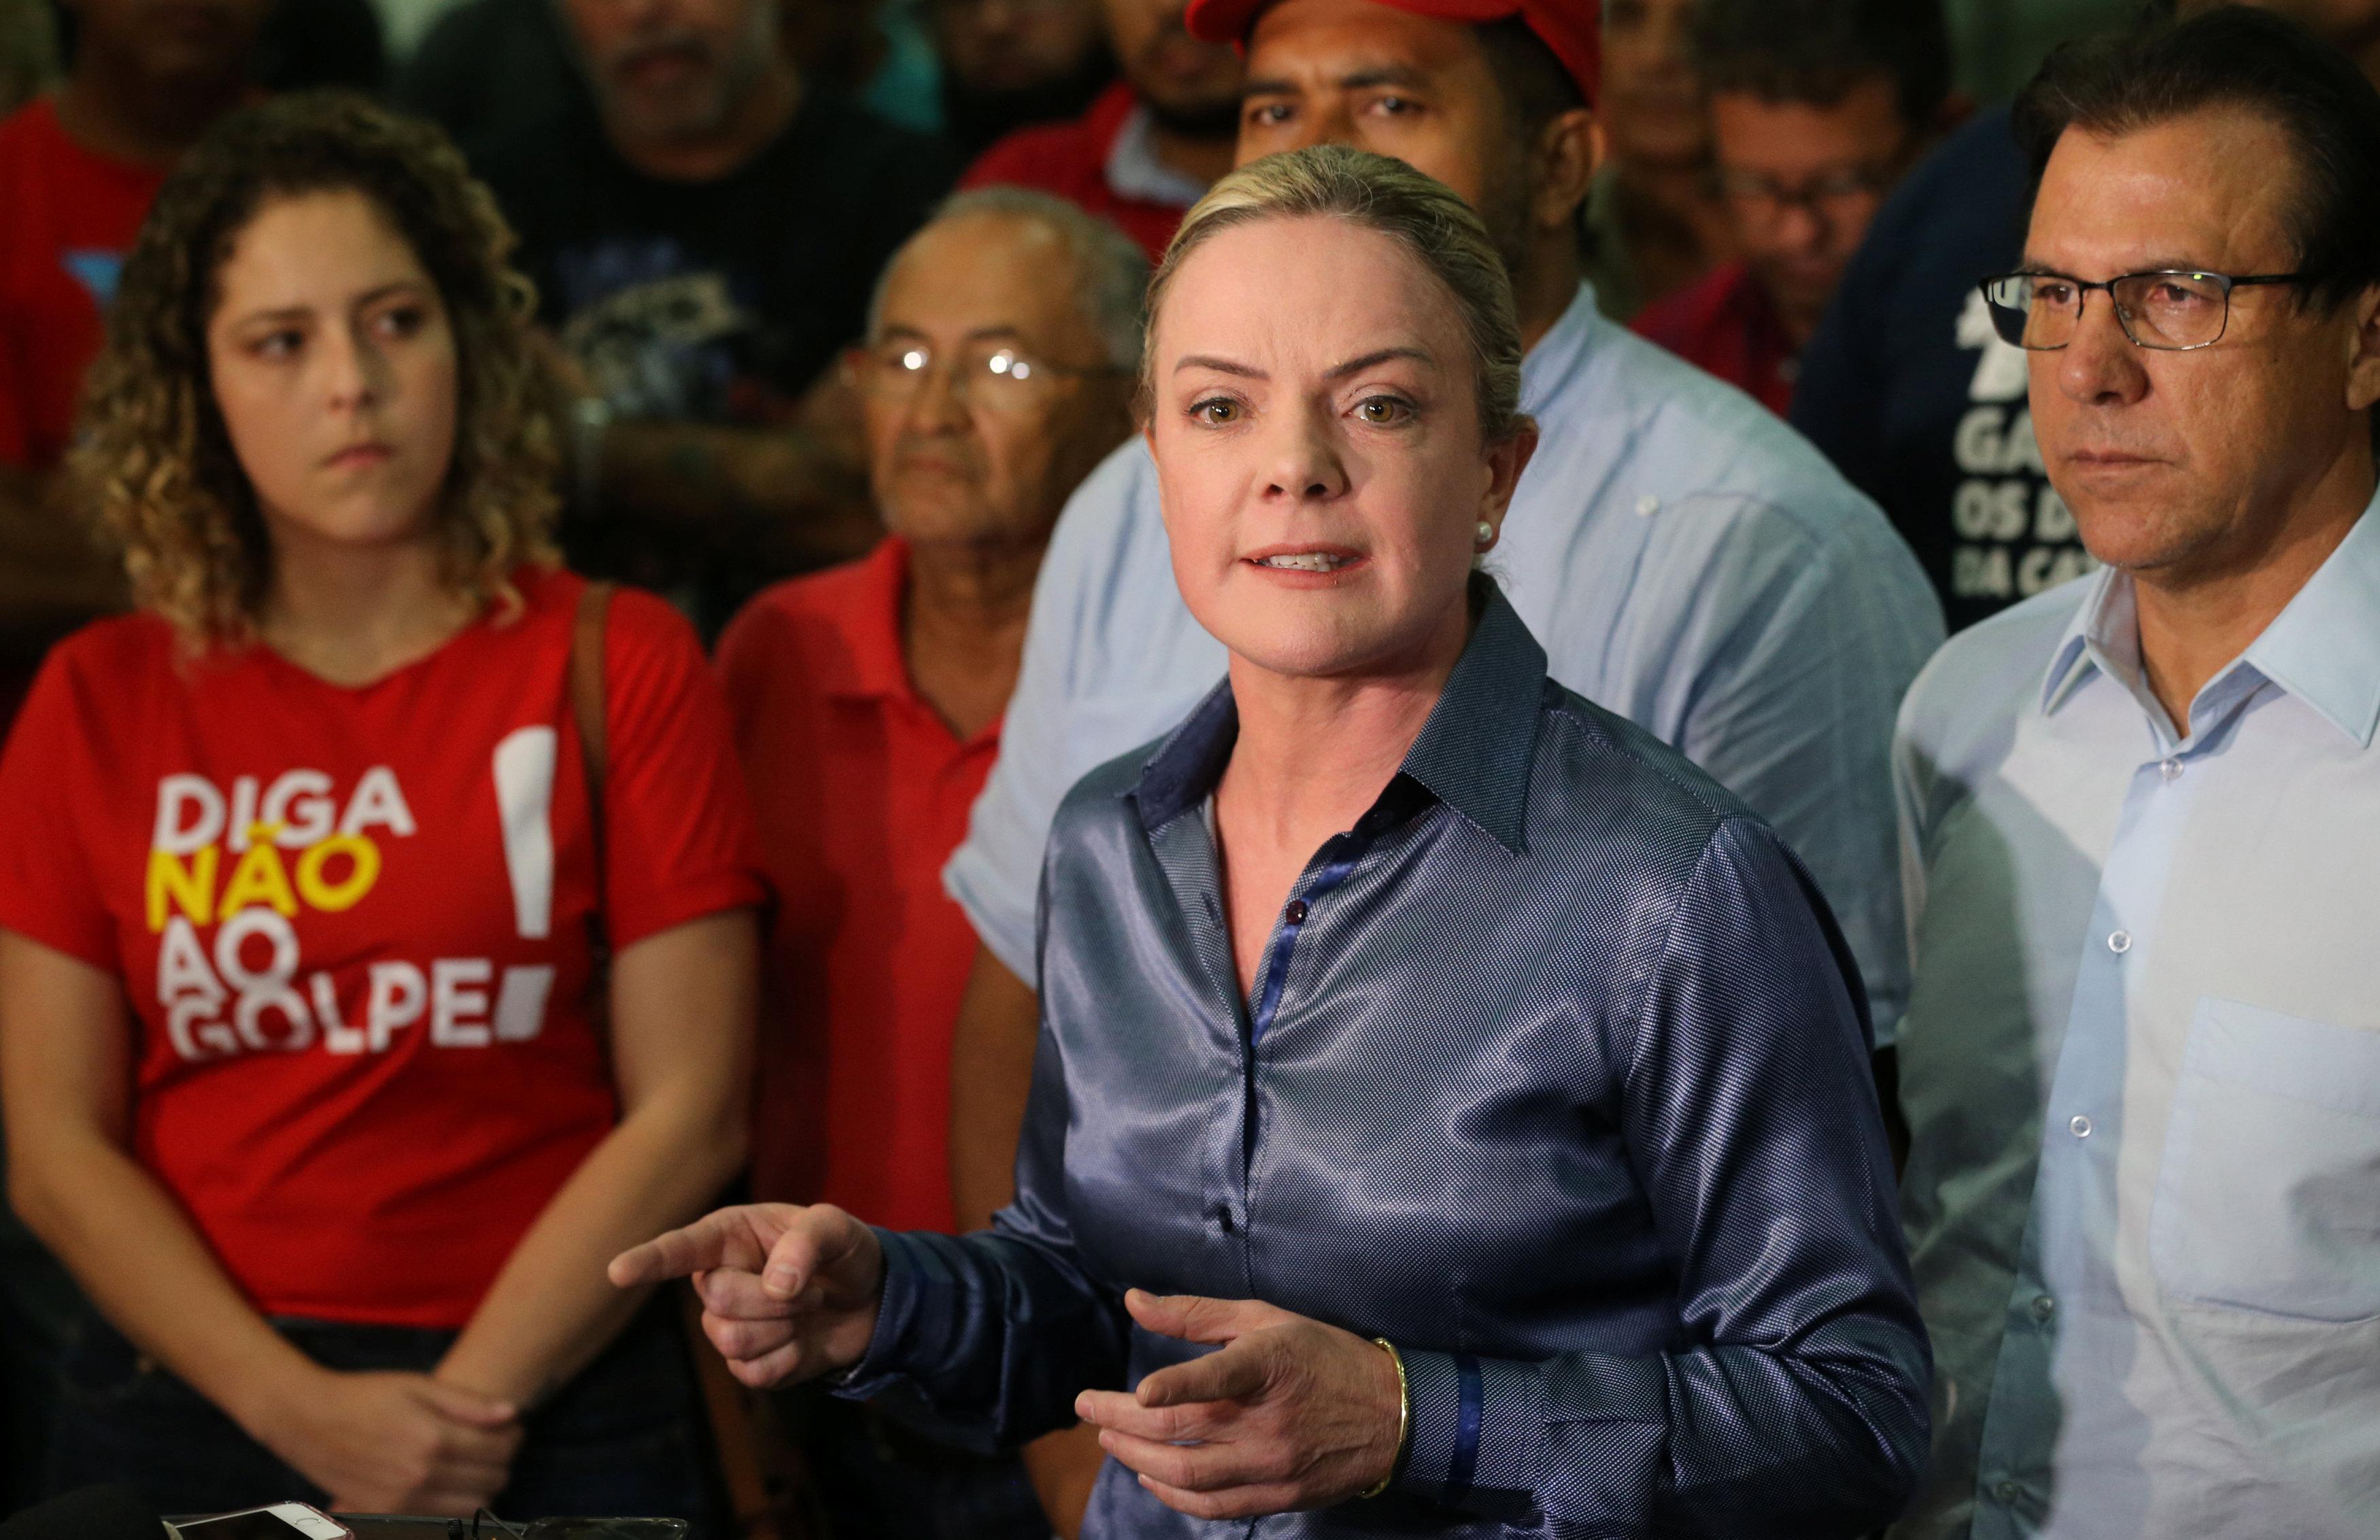 La senadora Gleisi Hoffmann en la manifestación frente al sindicato metalúrgico en Bernardo do Campo (REUTERS/Paulo Whitaker)